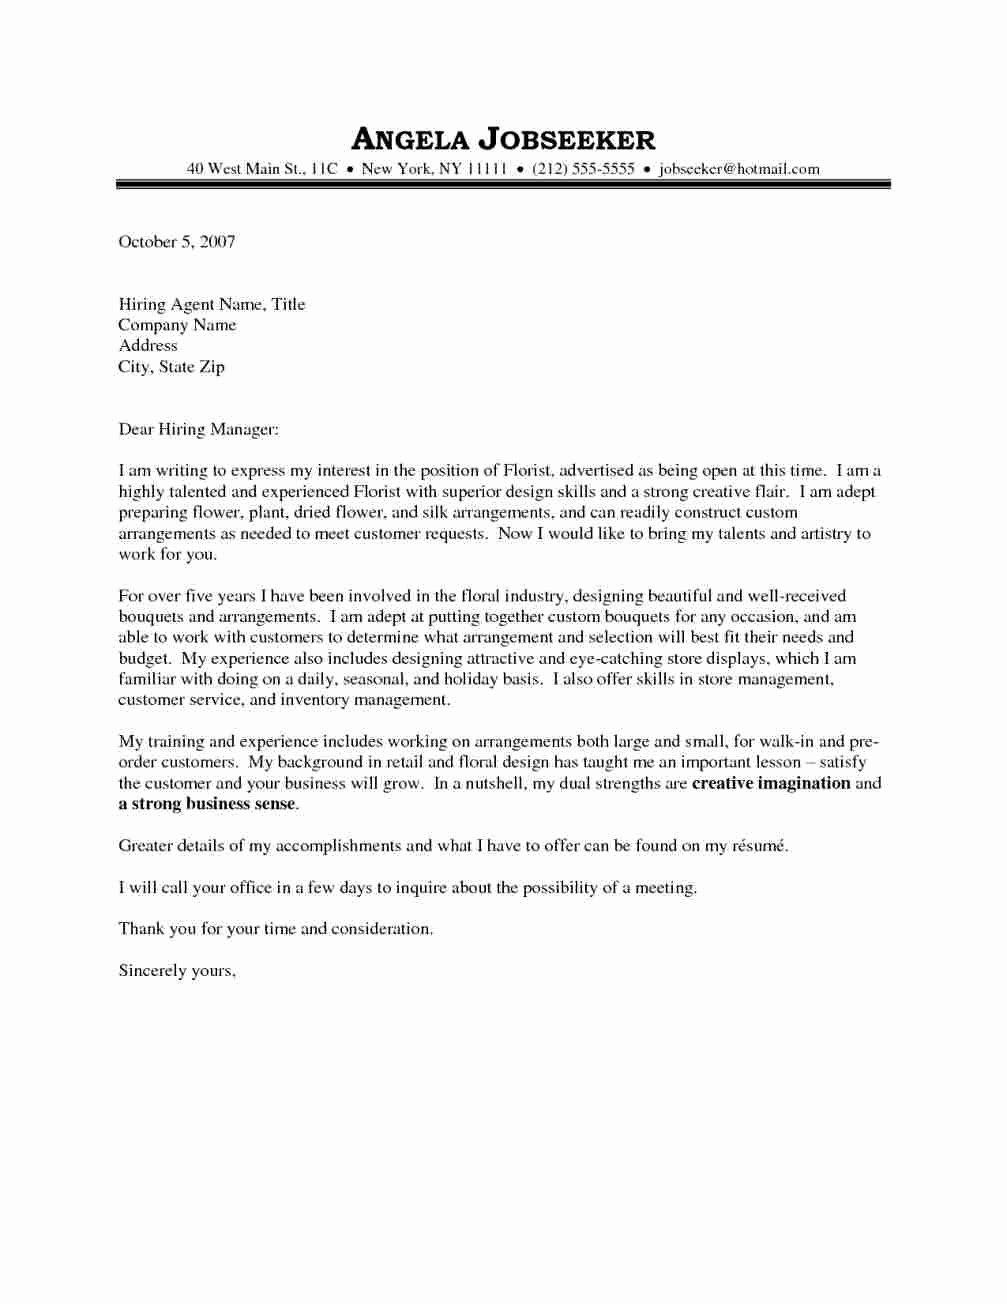 Medical Billing and Coding Cover Letter Samples